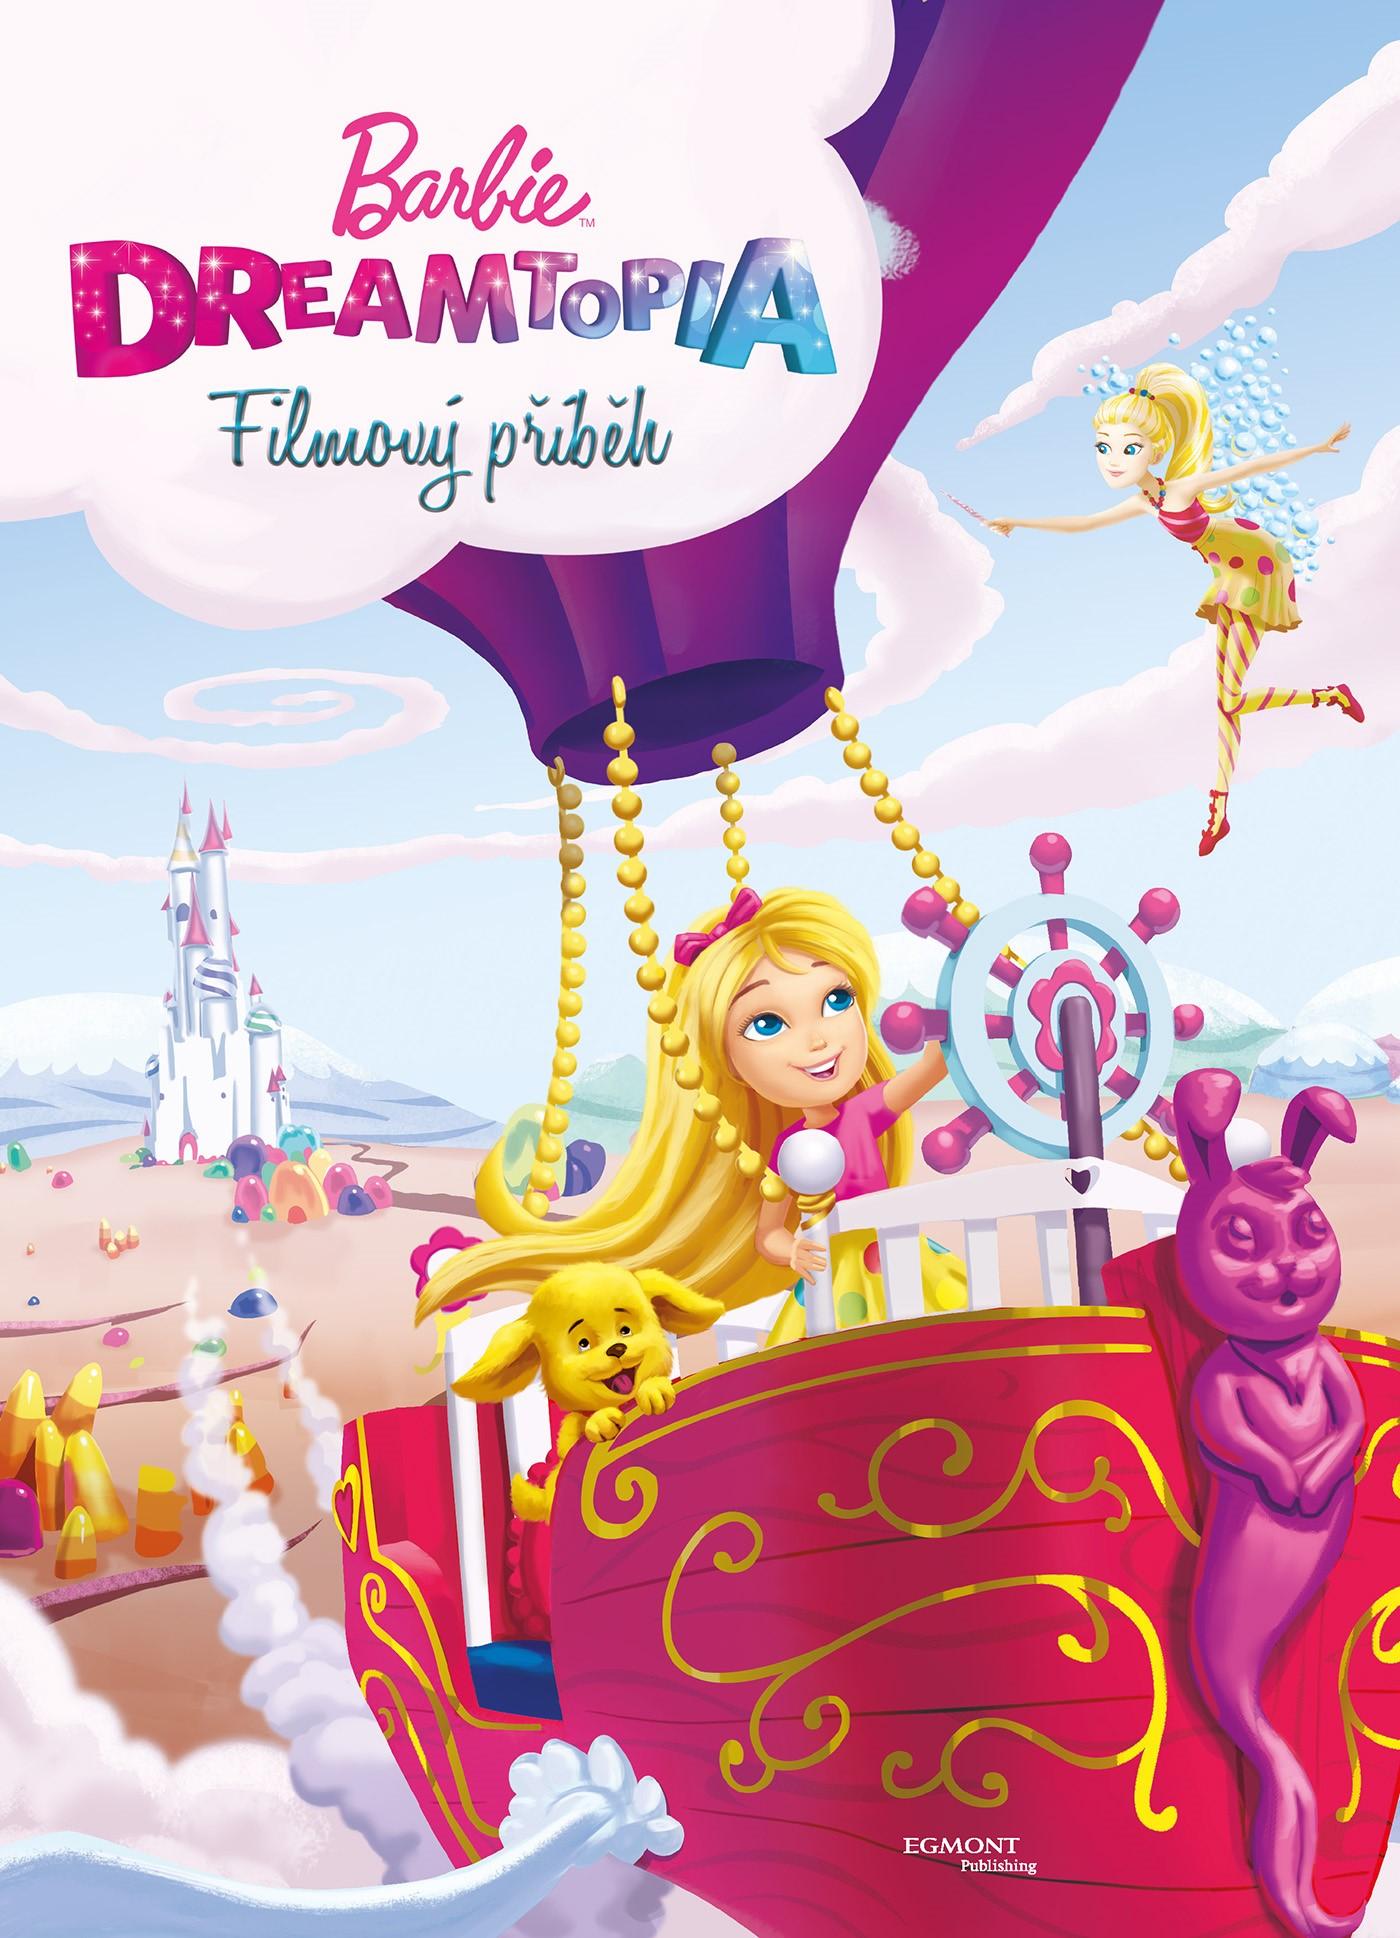 Barbie Dreamtopia - Filmový příběh